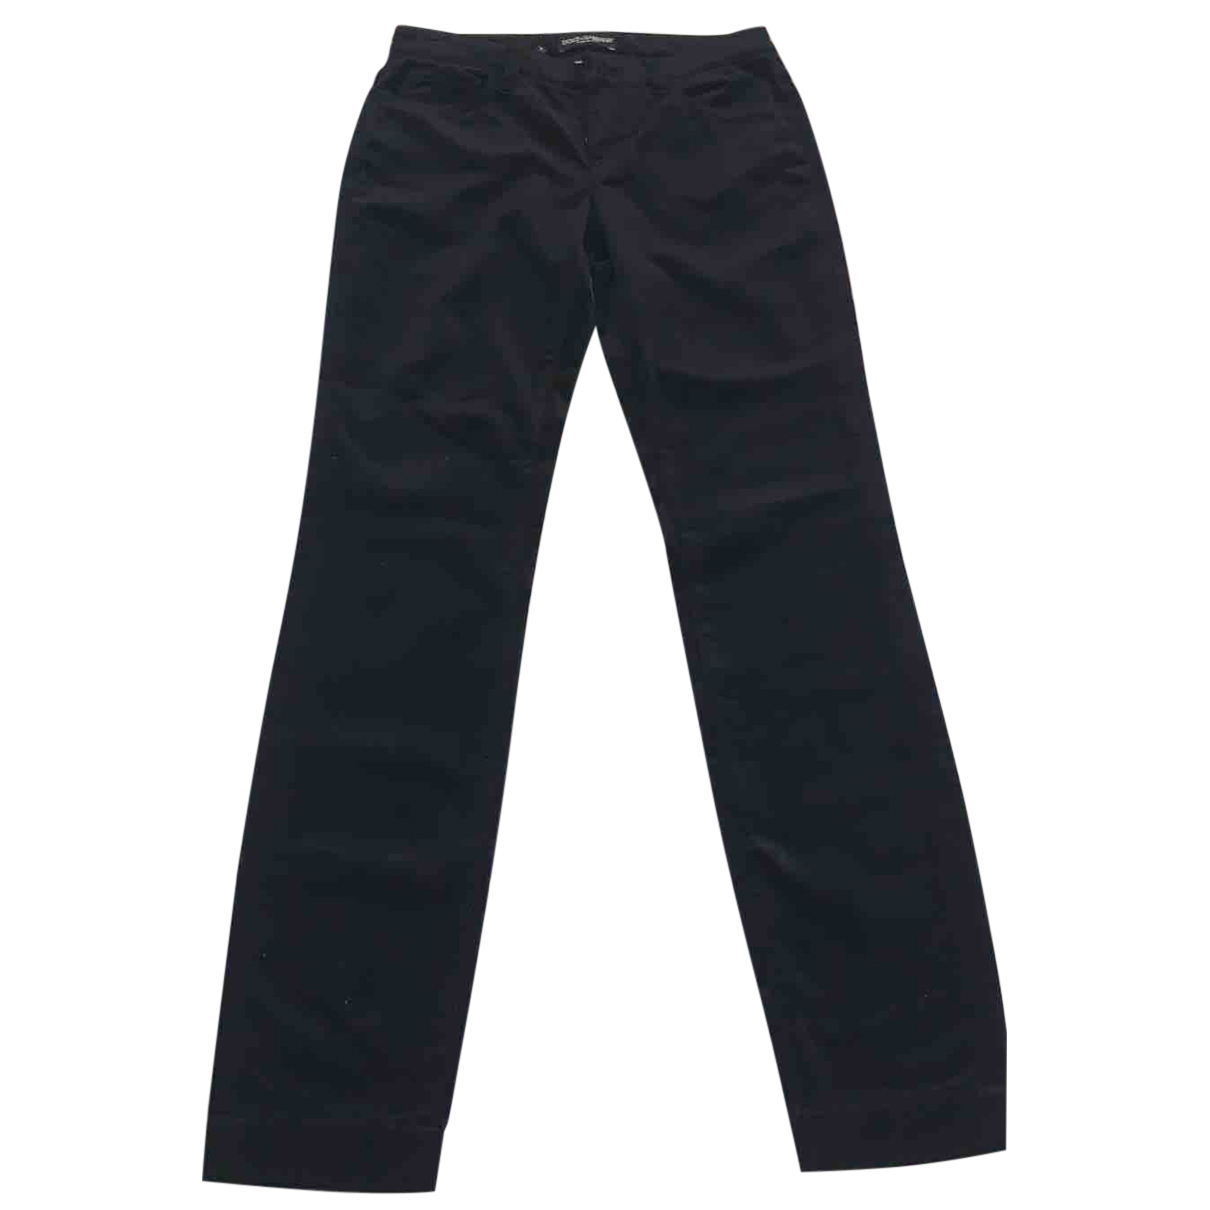 Dolce & Gabbana N Black Cotton Trousers for Women 34 FR